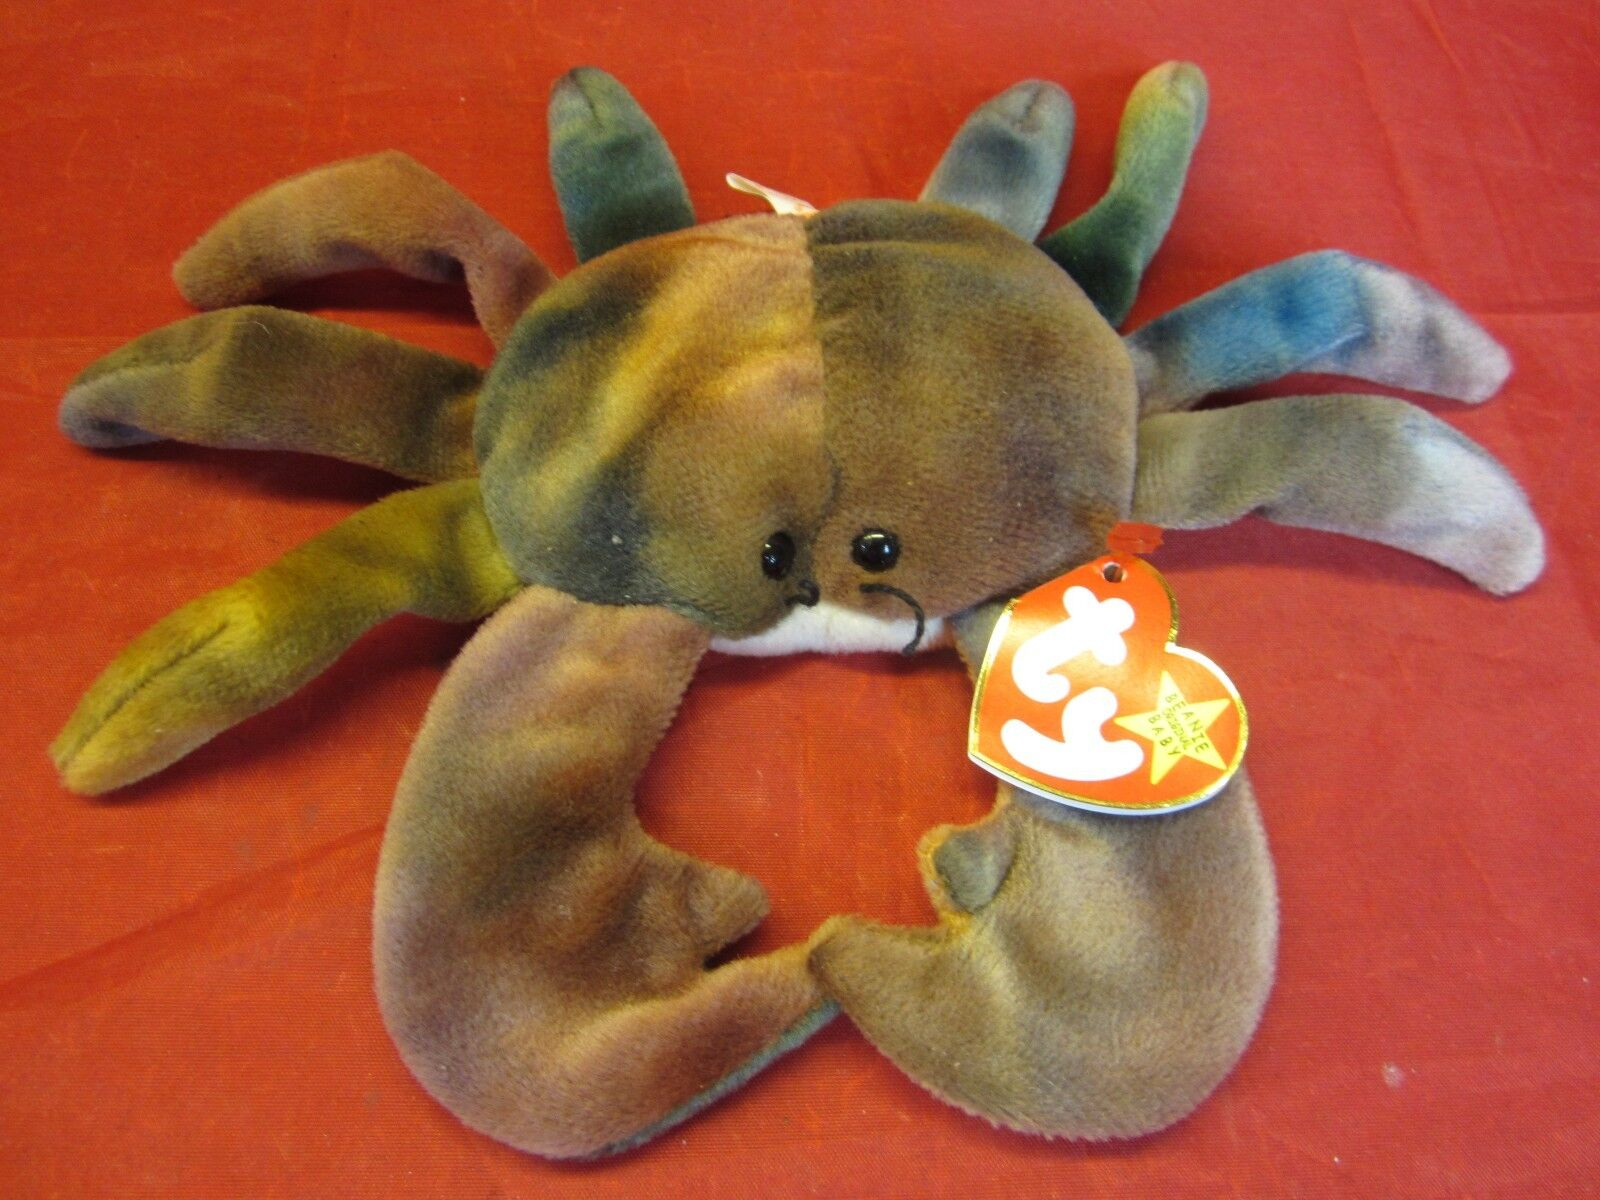 a7247c8c84b Rare TY Beanie Baby Claude Claude Baby the Crab Bear Original Collectible w  Major Tag Errors